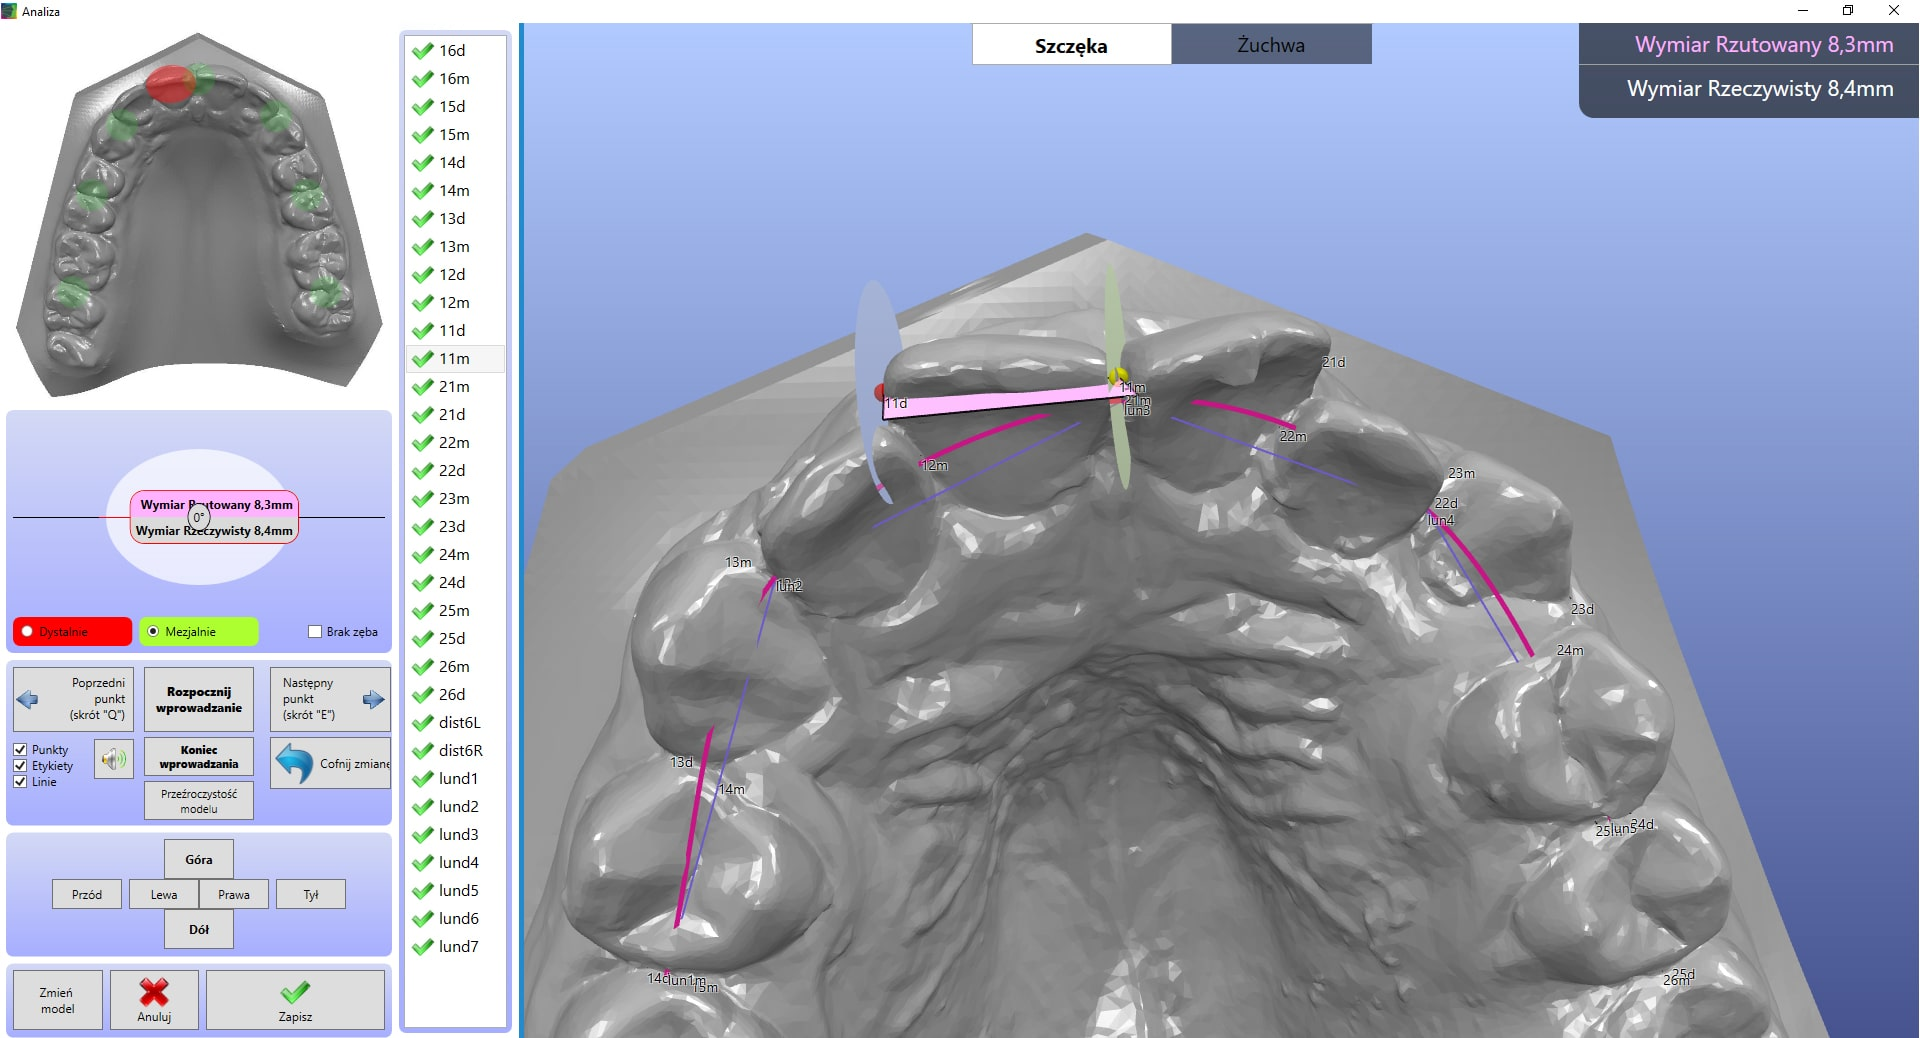 7_7.analiza-modeli-3D-1920x1038-min